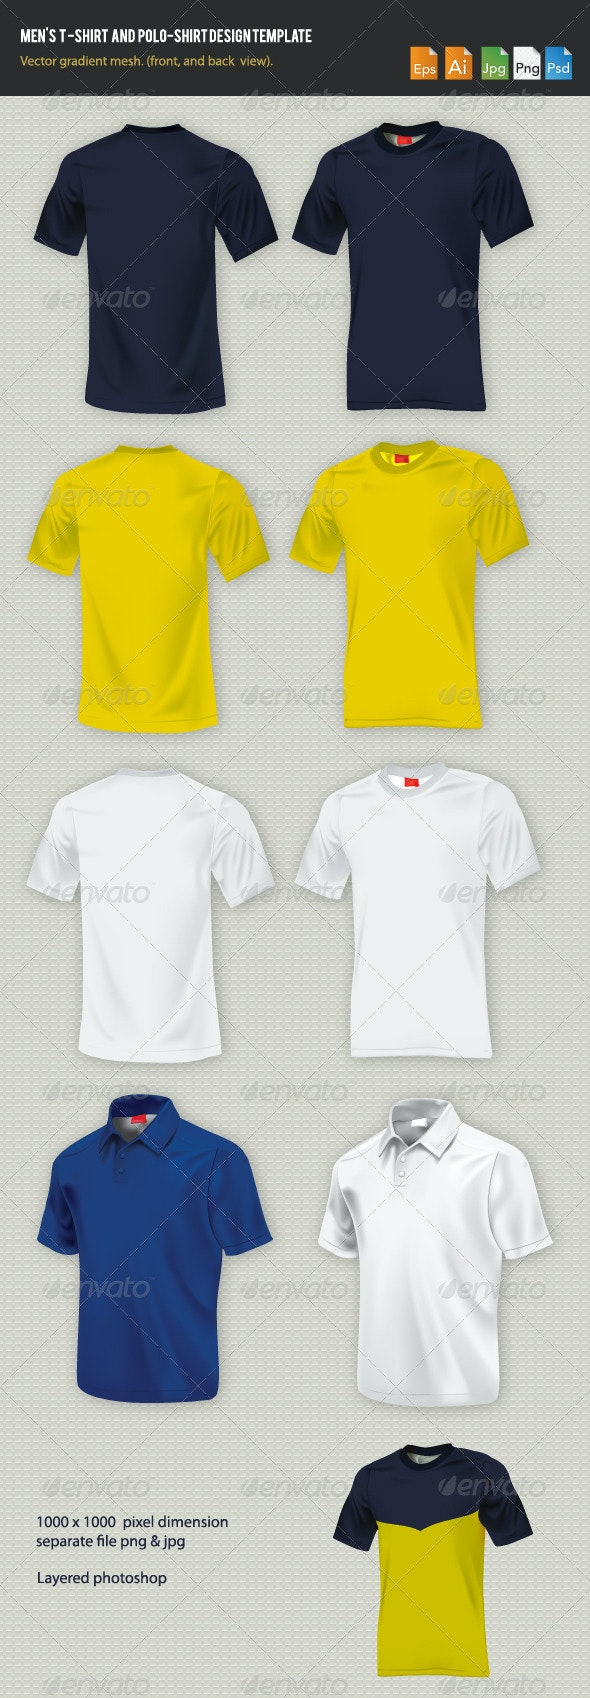 Men's t-shirt design template  - Man-made Objects Objects